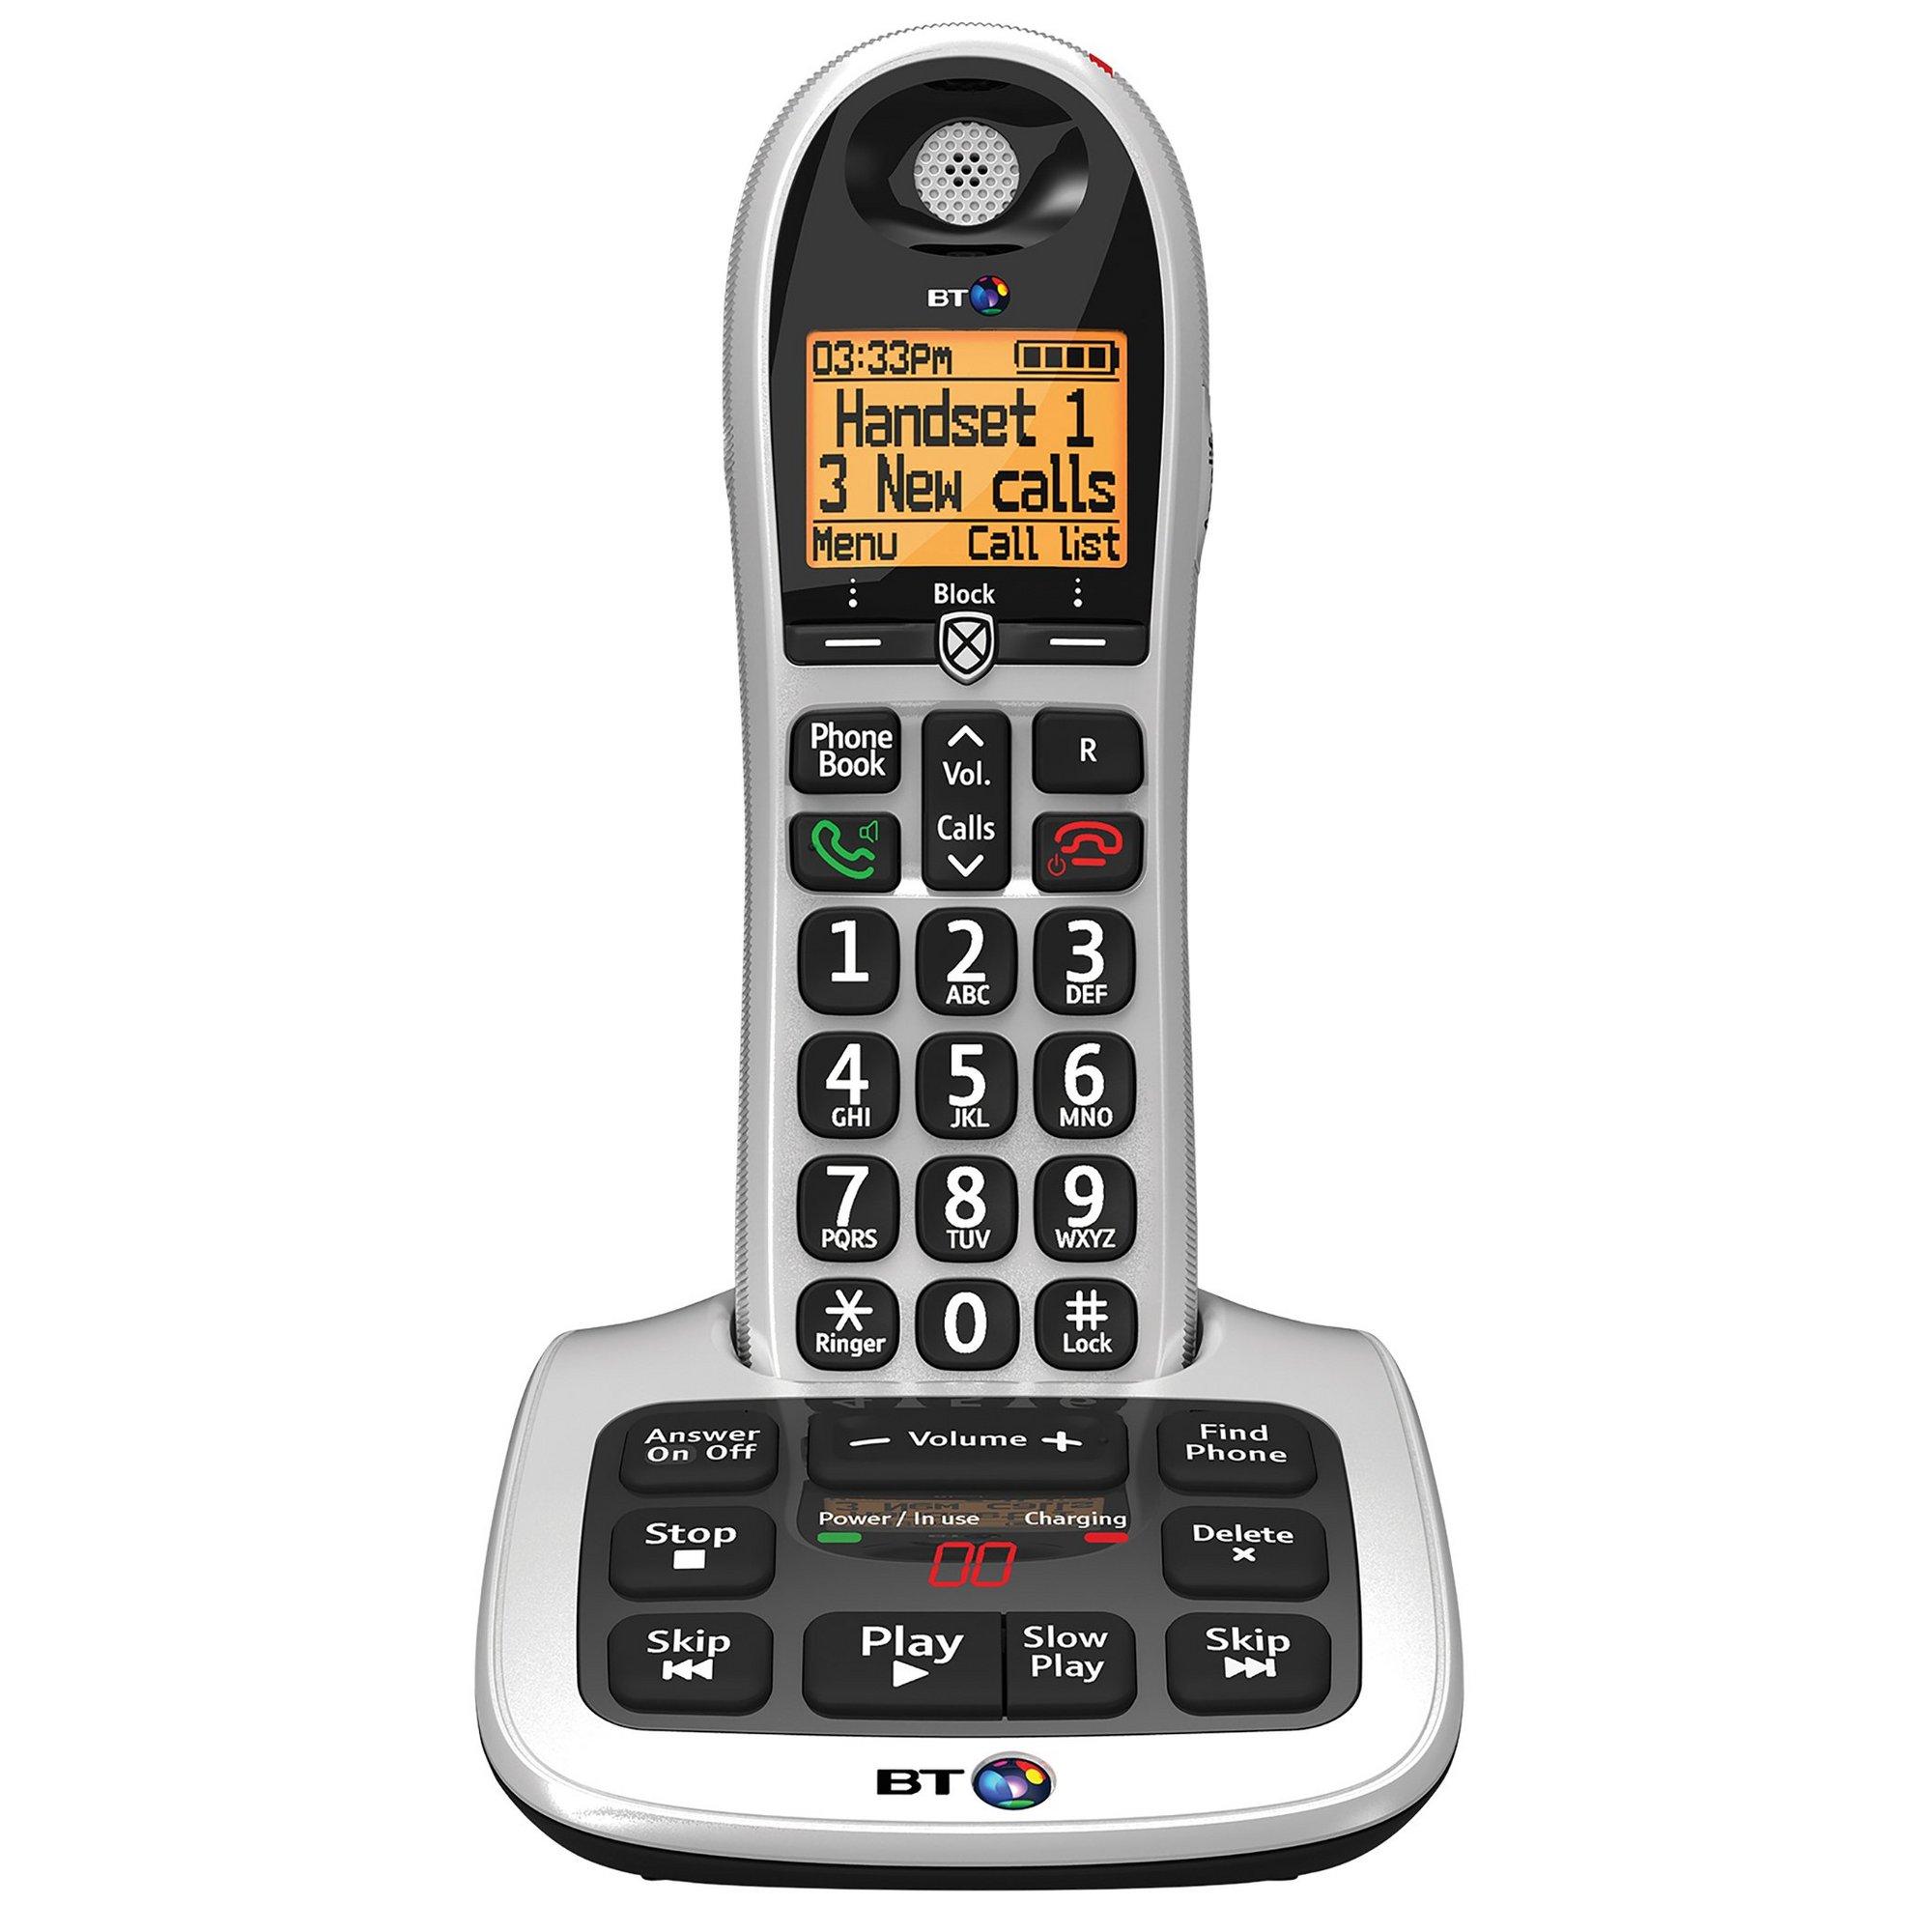 Image of BT 4600 Premium Big Button Single